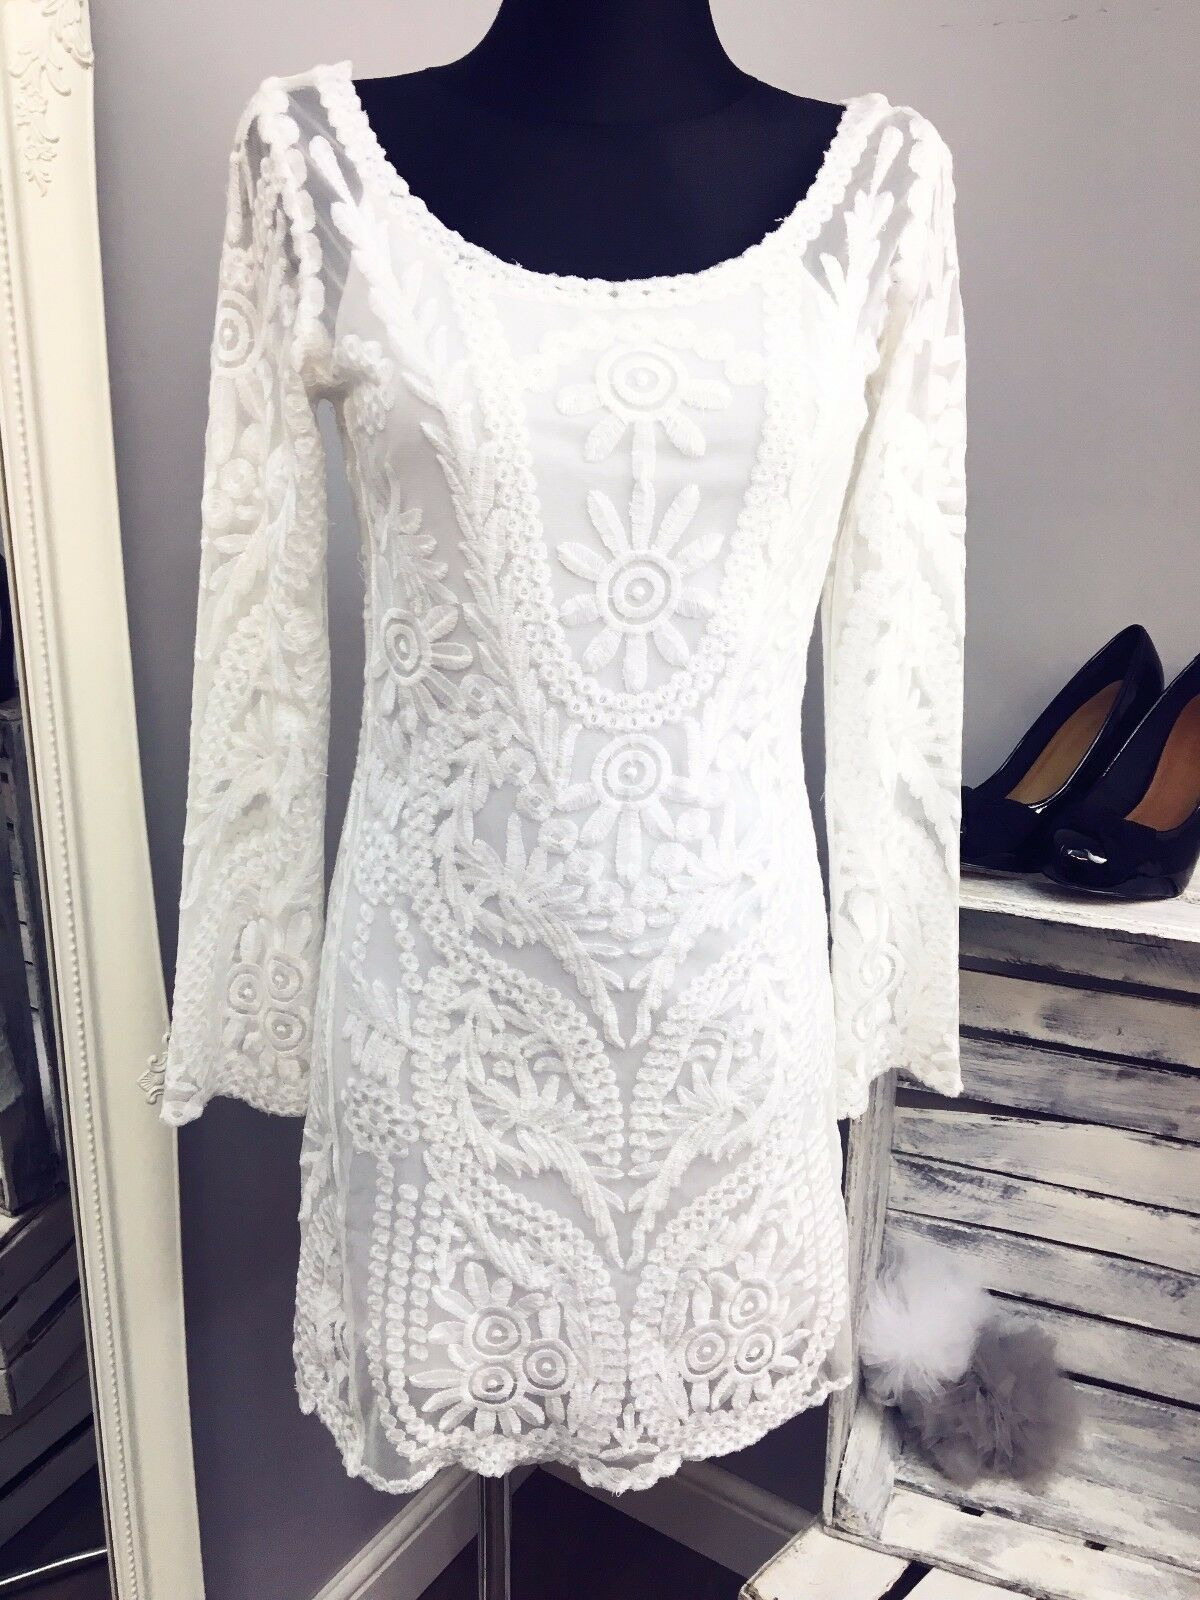 ff25de42a01c Glamgoldus Long Sleeve Dress RRP (AS-45 2) ASOS Lace nnpuay2346 ...